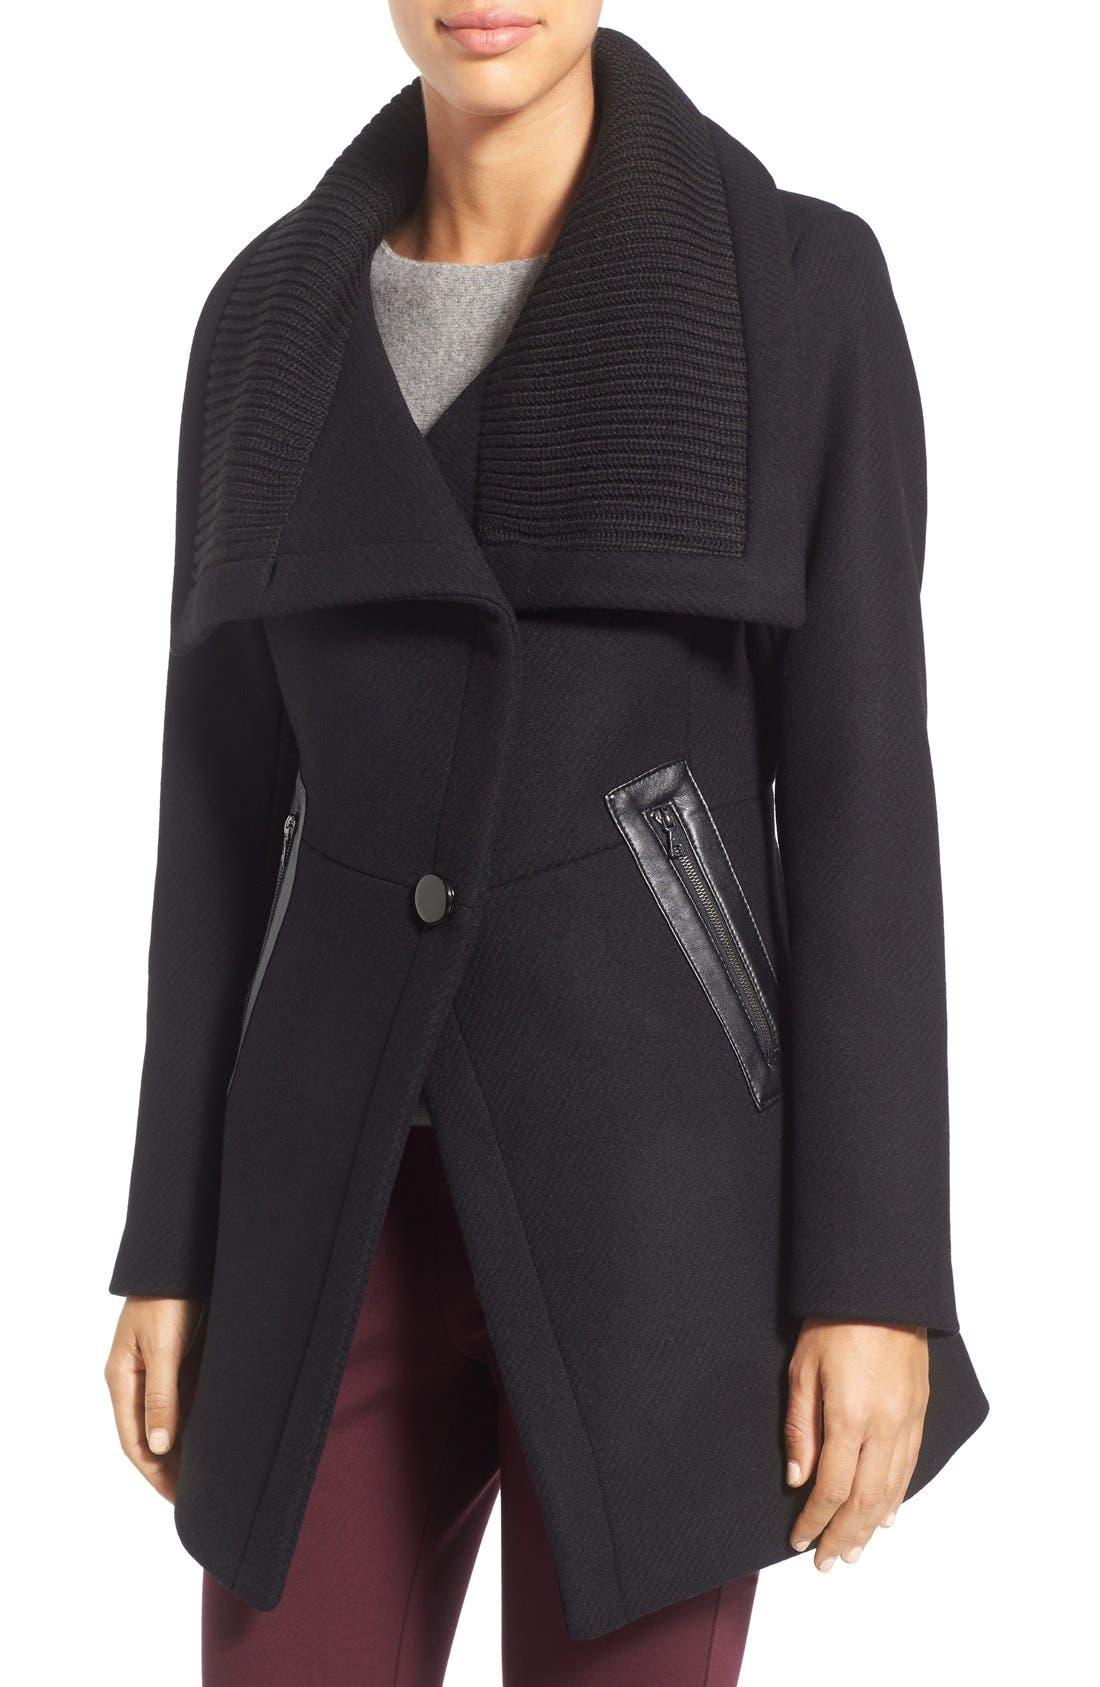 'Maddi' Knit Collar Cutaway Wool Blend Coat,                             Main thumbnail 1, color,                             001